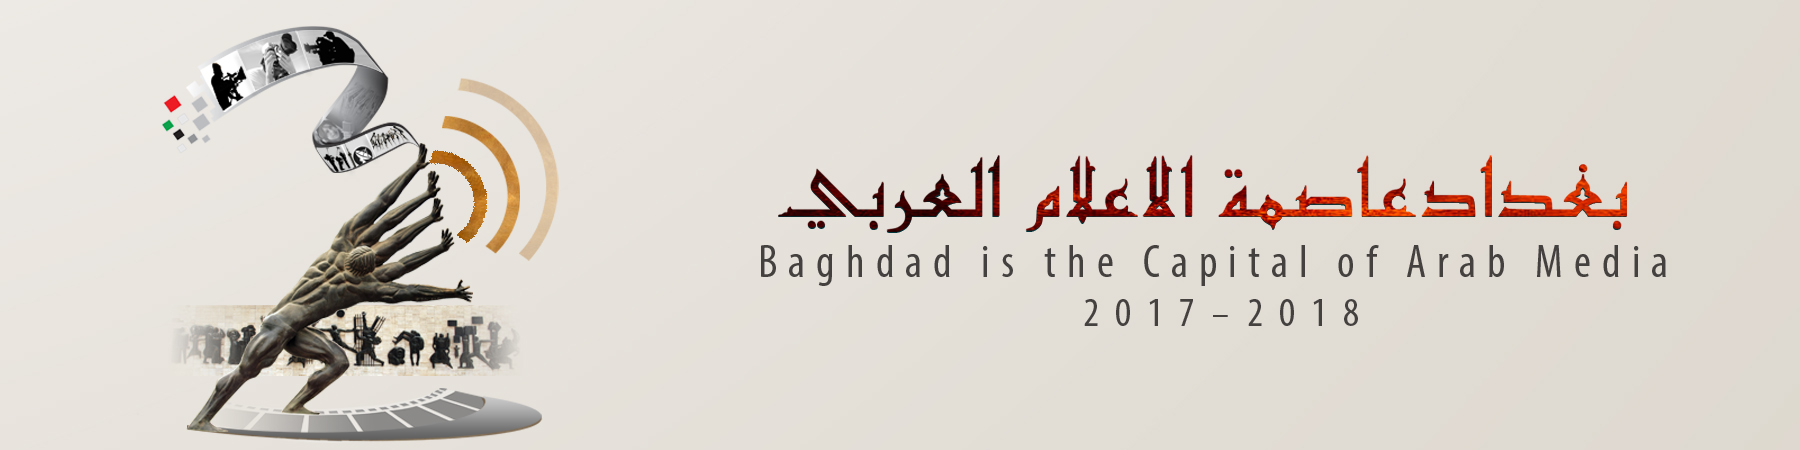 baghdad_media